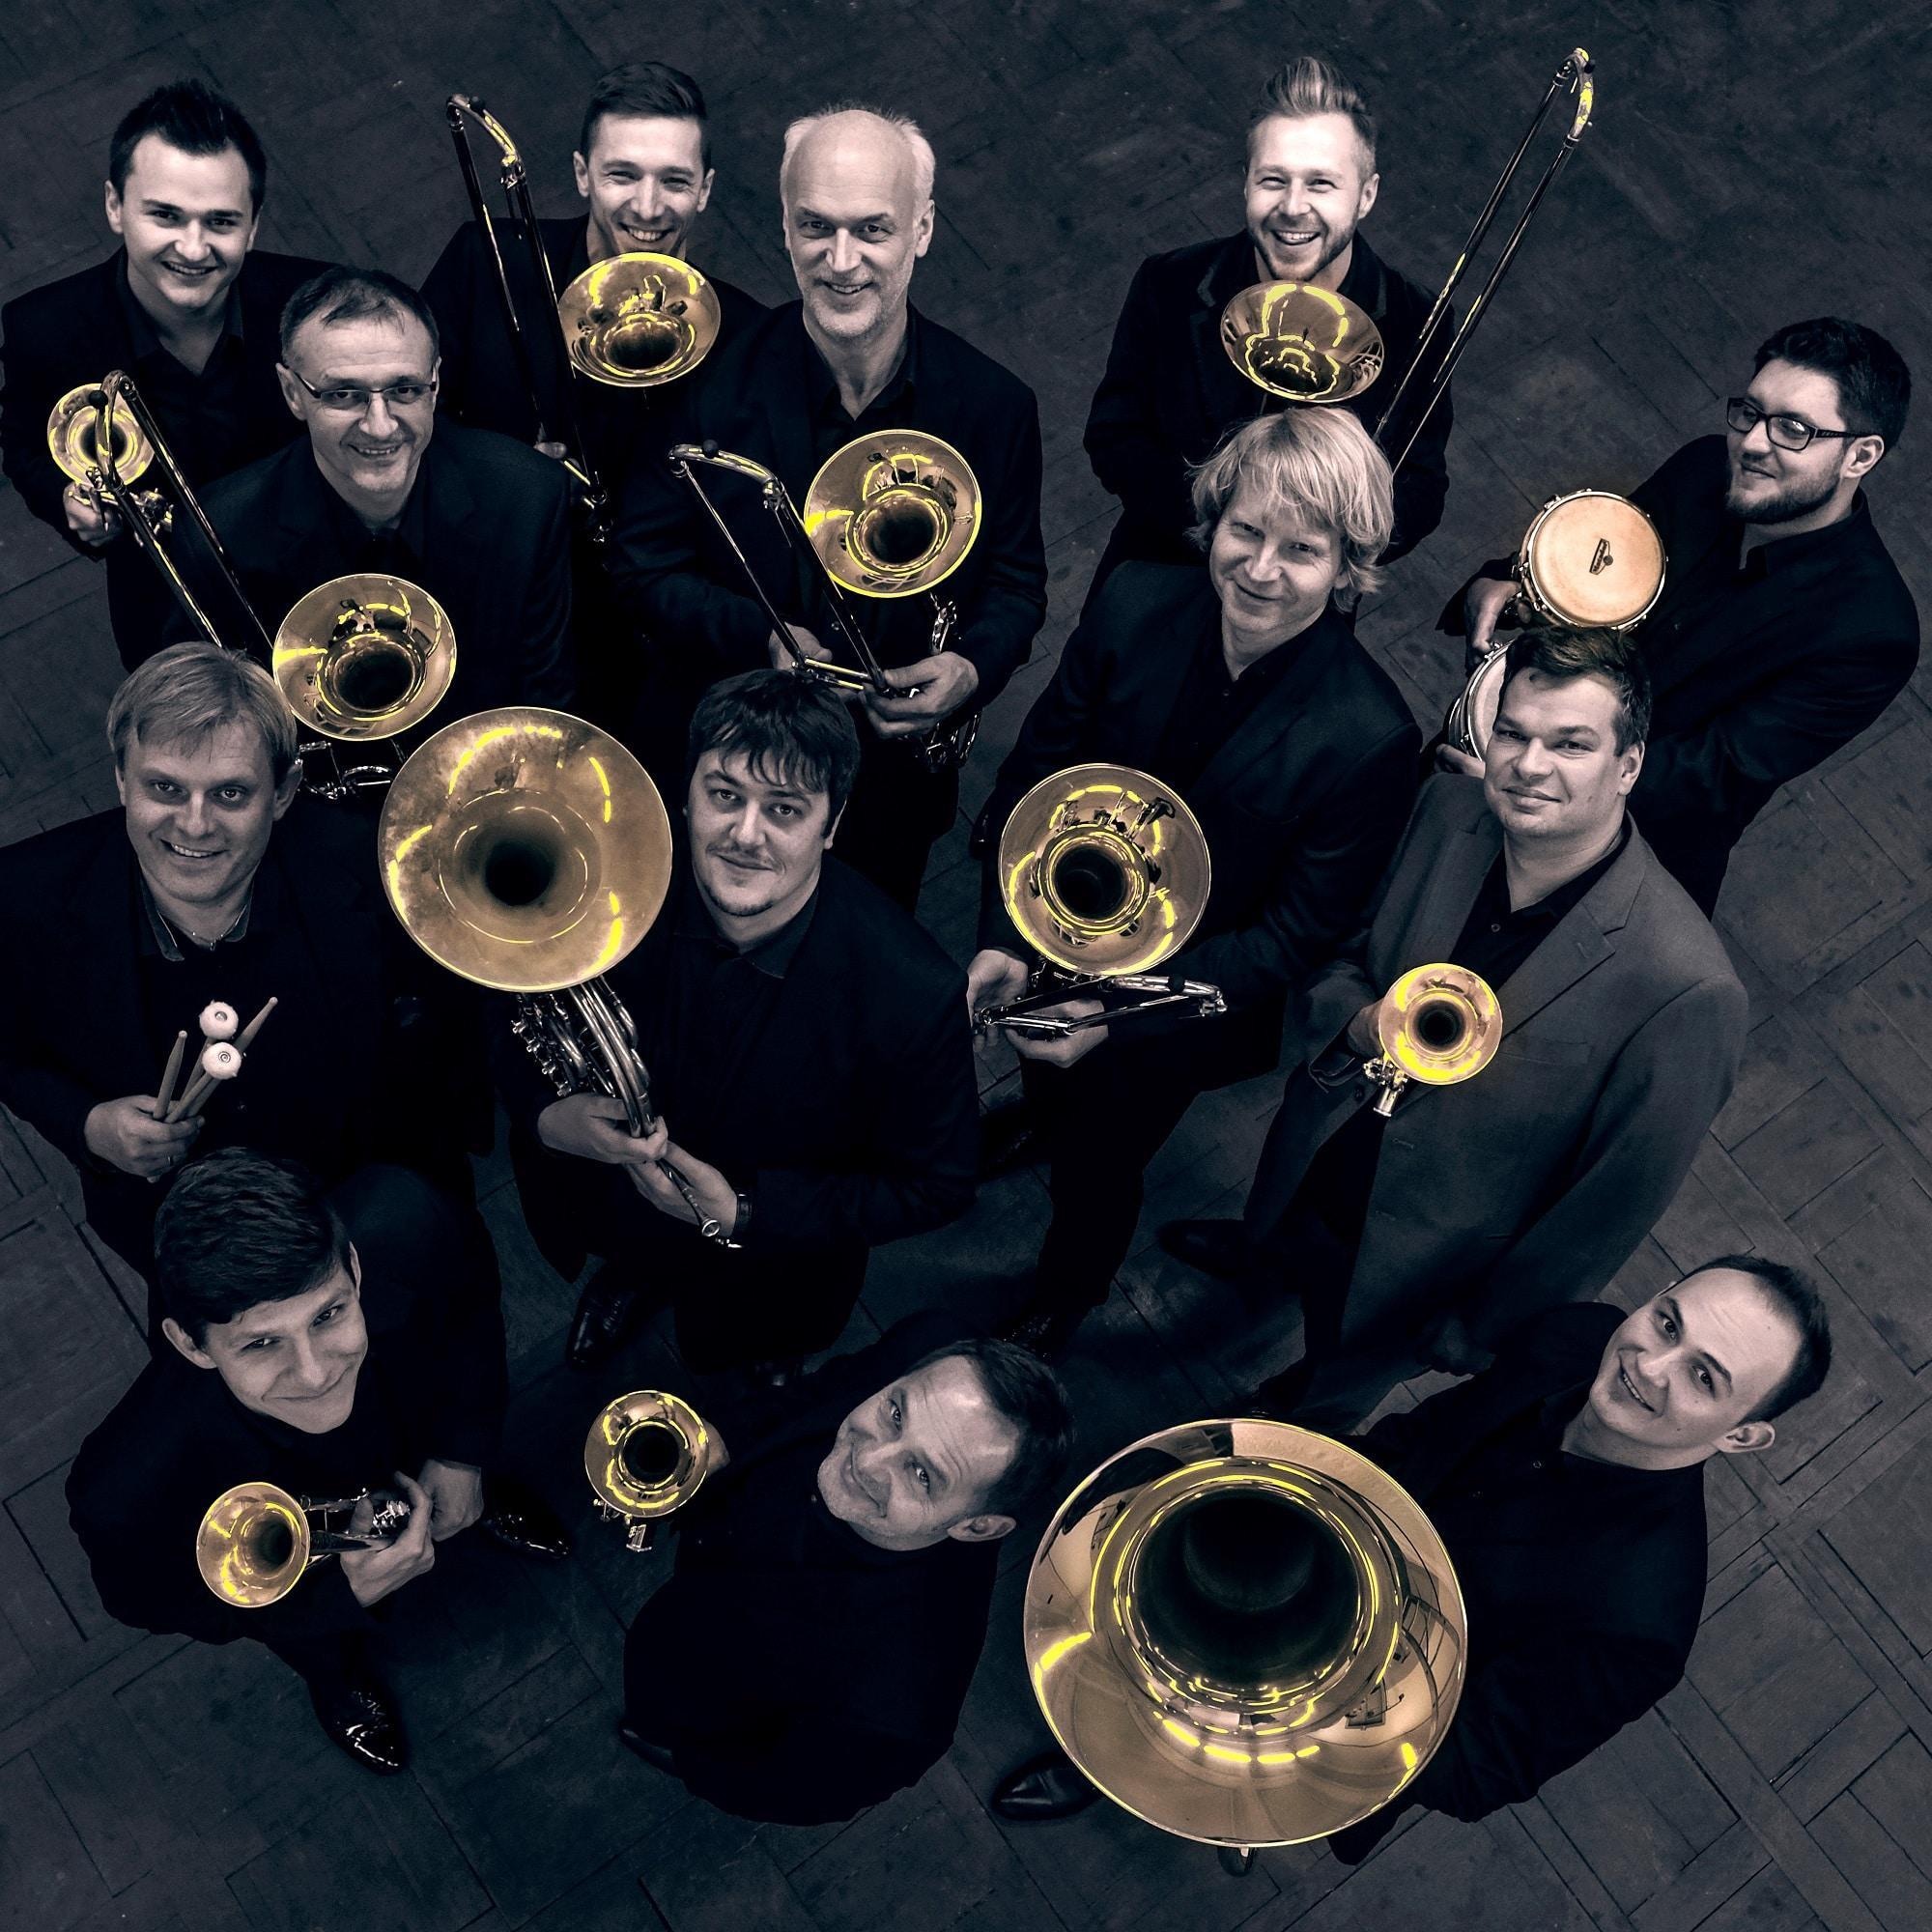 Festiwal Sinfonia Varsovia Swojemu Miastu